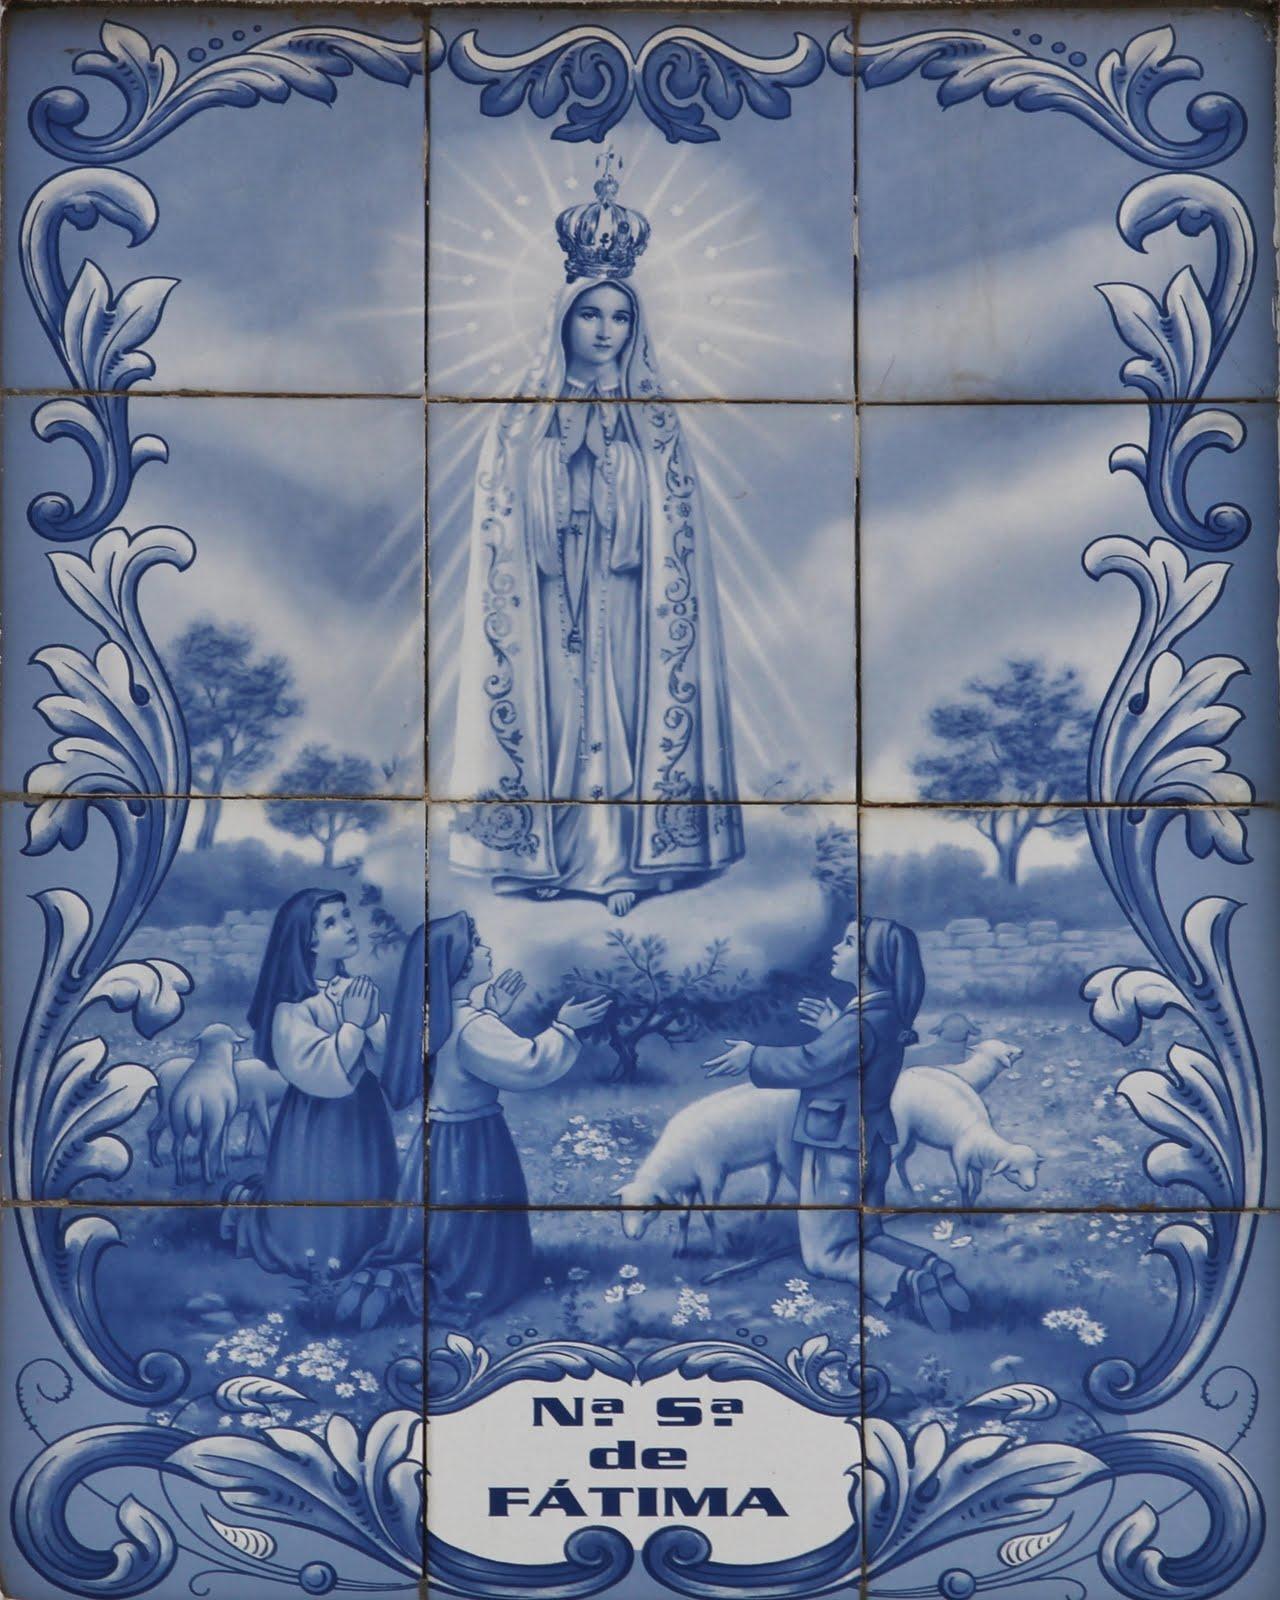 Fatima azuleros